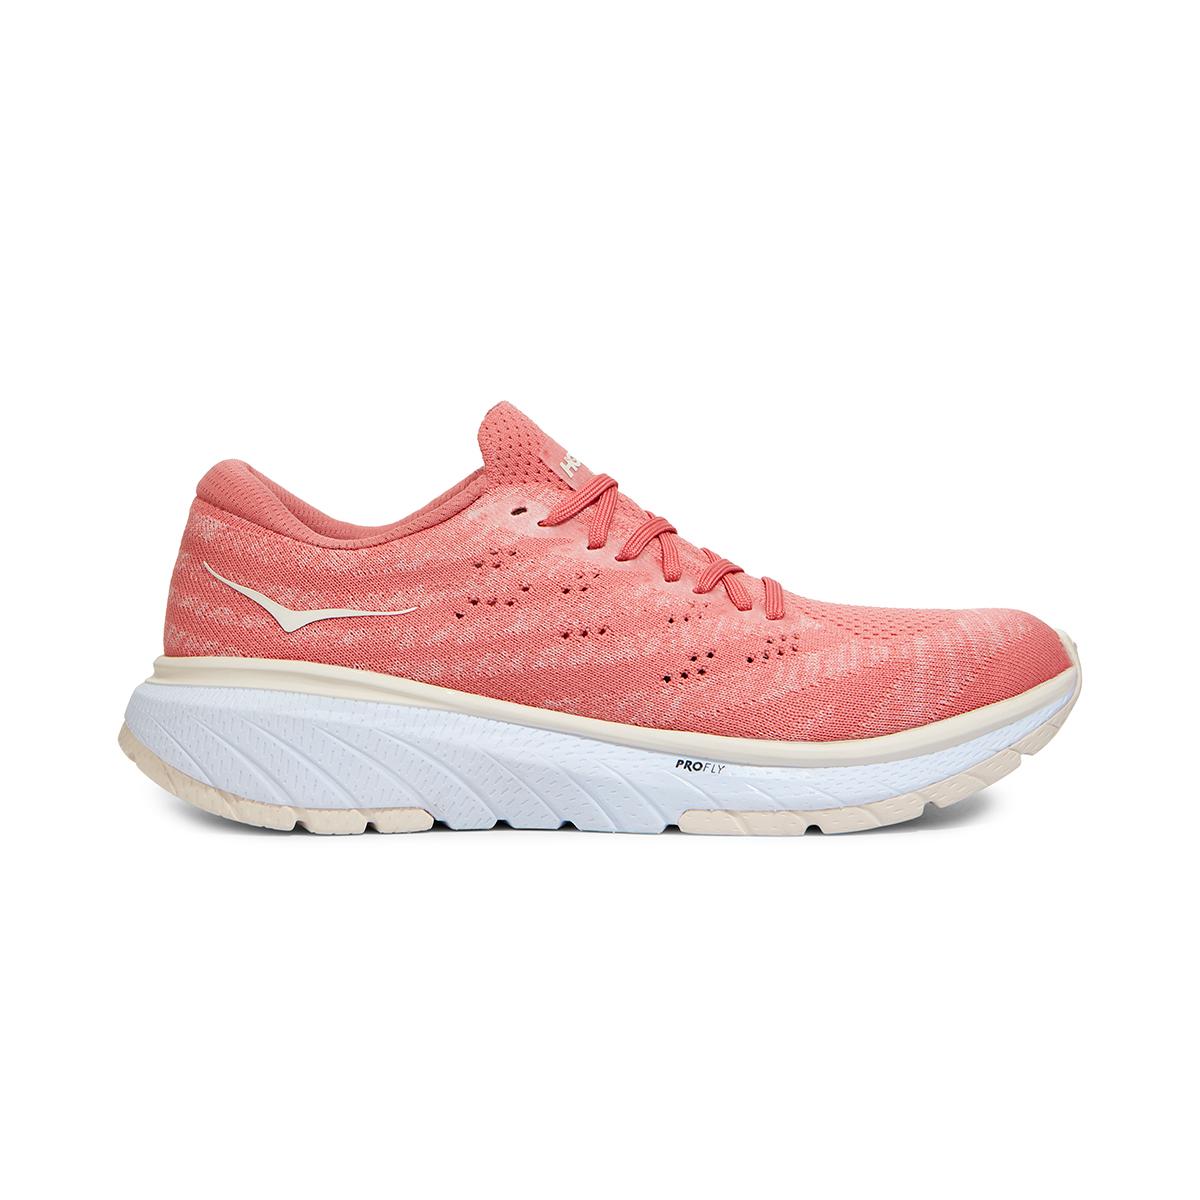 Women's Hoka One One Cavu 3 Running Shoe - Color: Lantana/Eggnog - Size: 5 - Width: Regular, Lantana/Eggnog, large, image 1